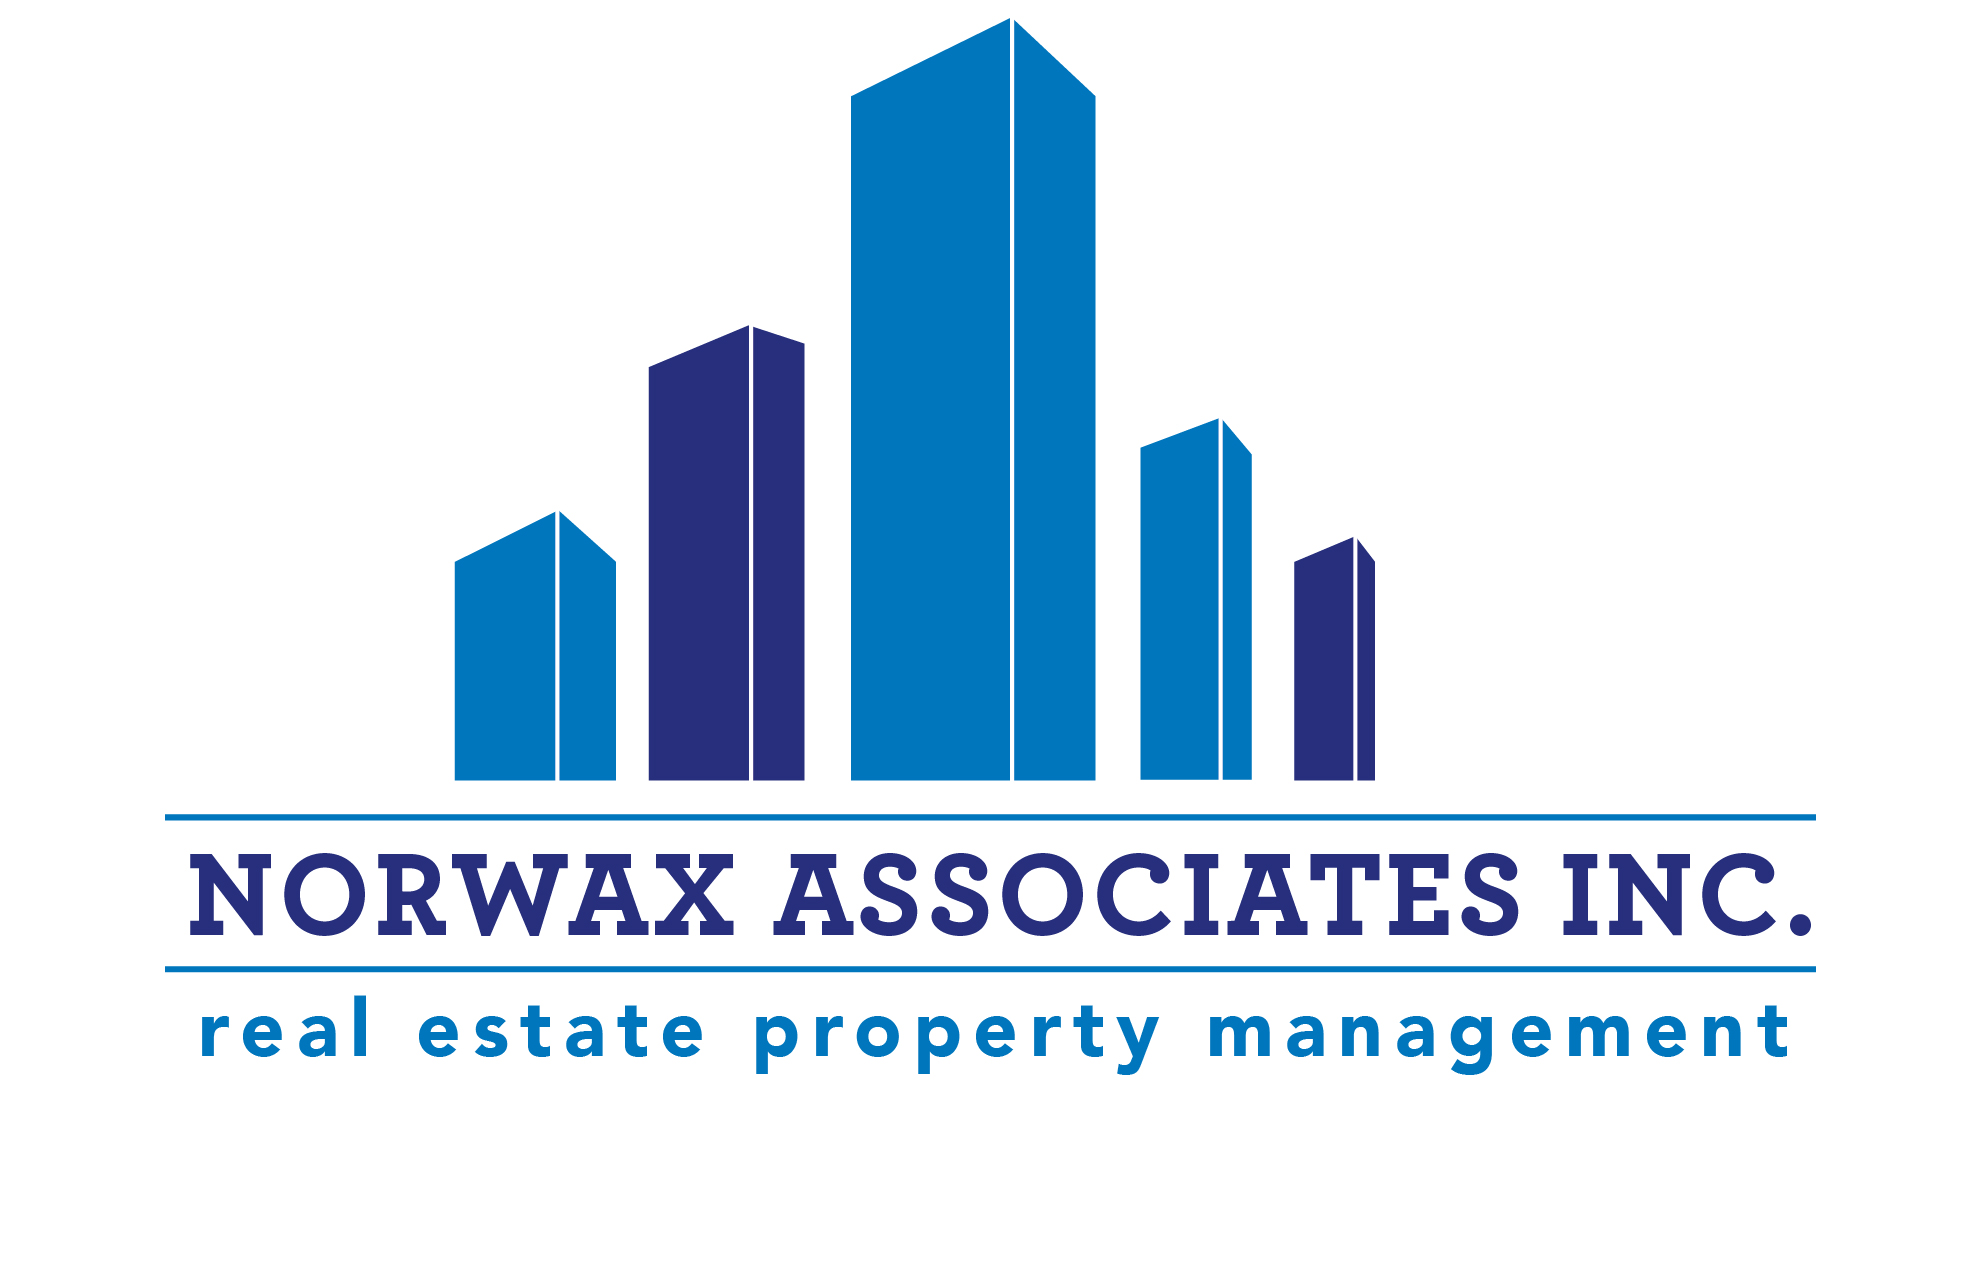 New York City Real Estate Property Management Logo Design